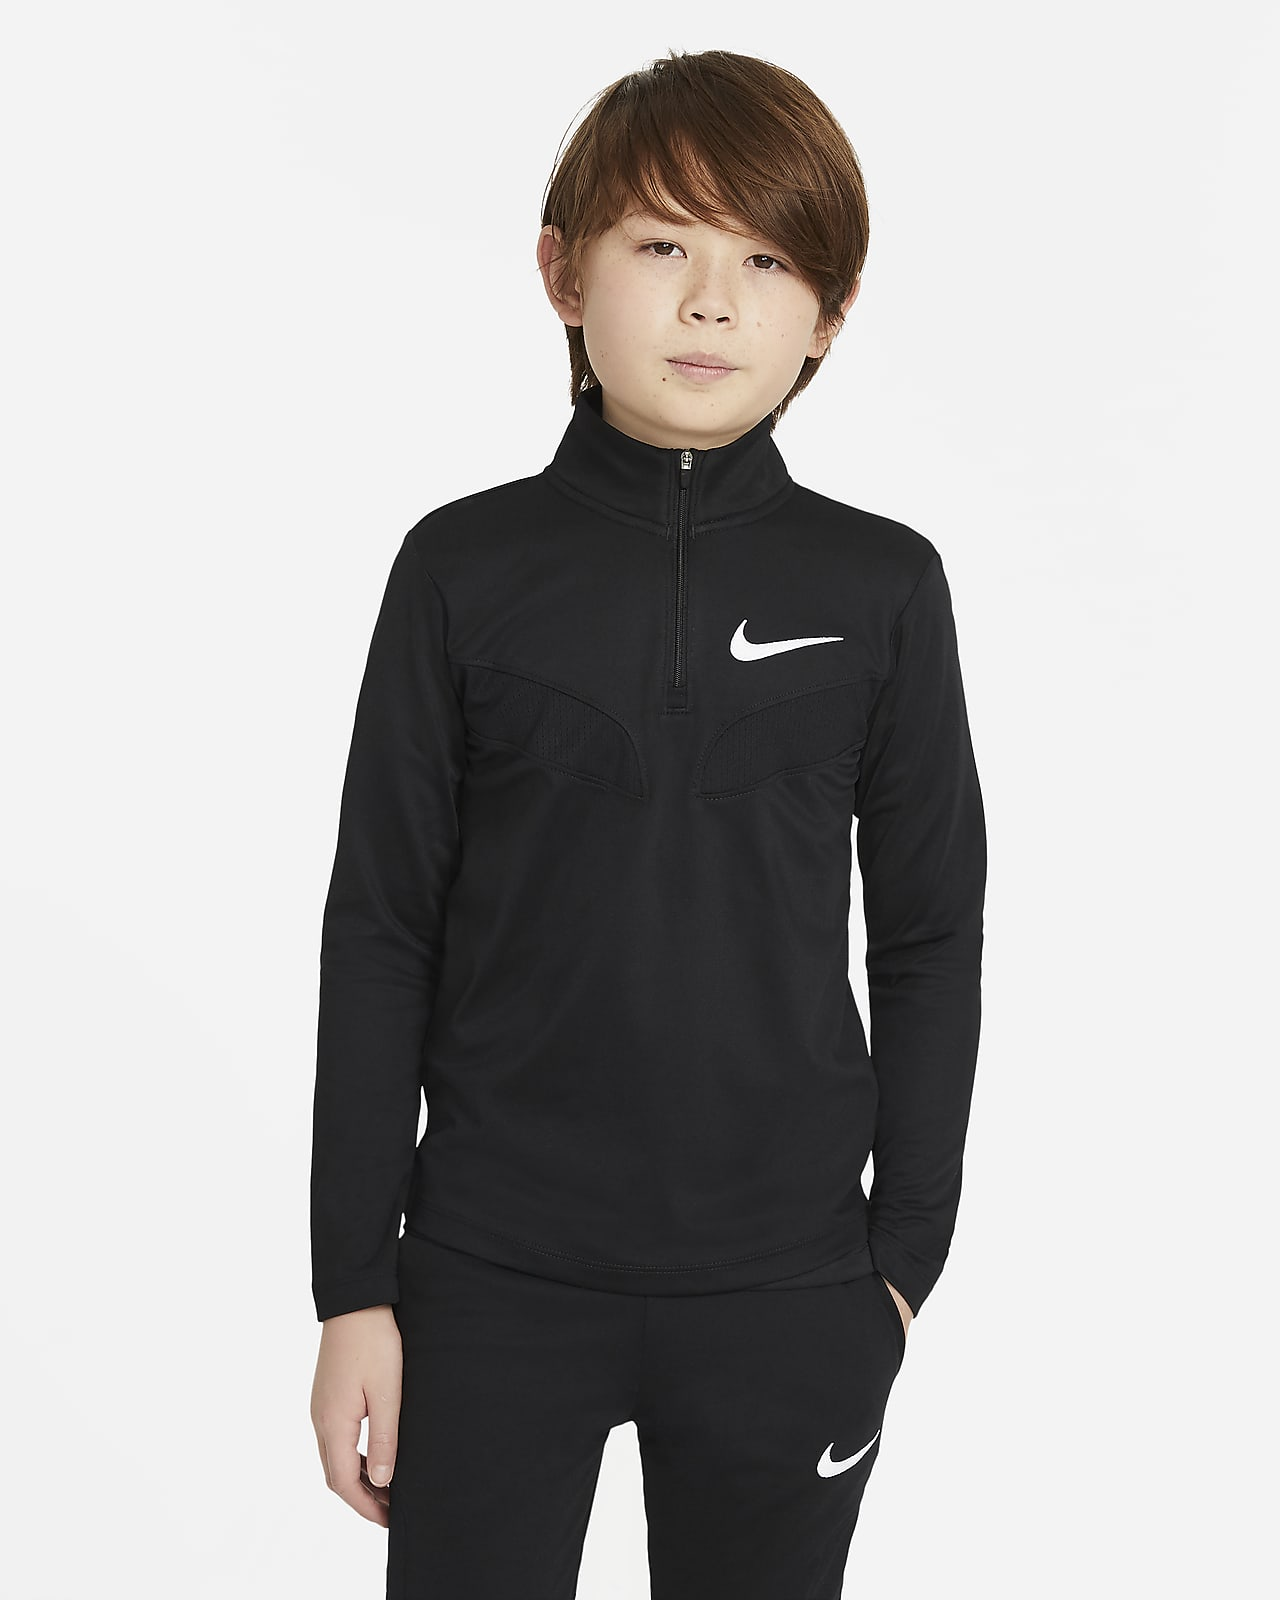 Maglia da training a manica lunga Nike Sport - Ragazzo